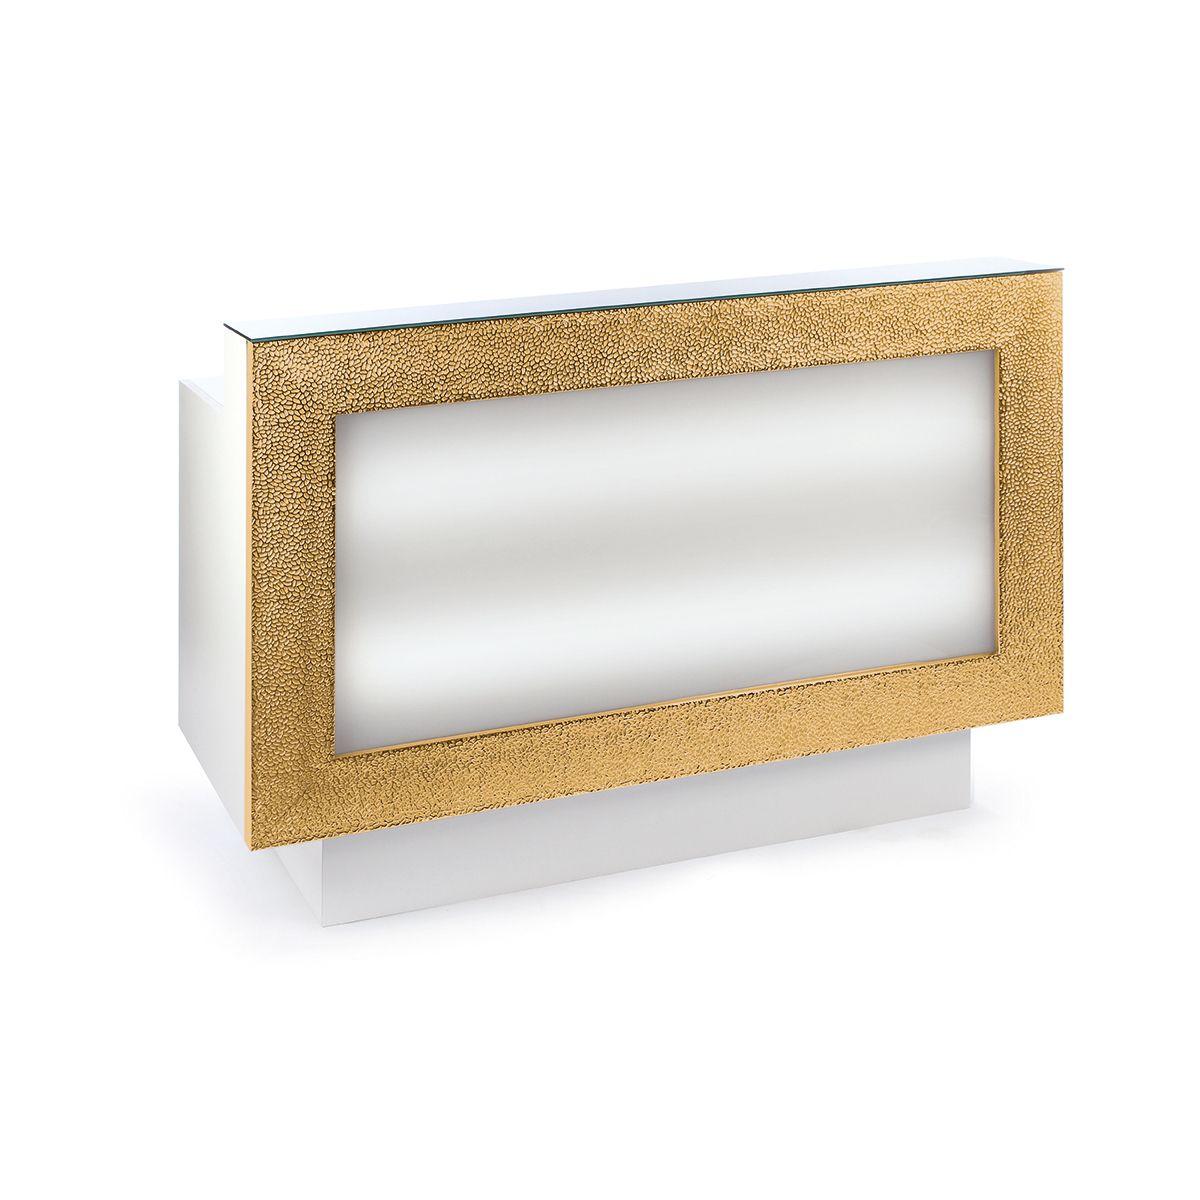 Nelson Mobilier - Manufacturer - Salon furniture Made in France ...